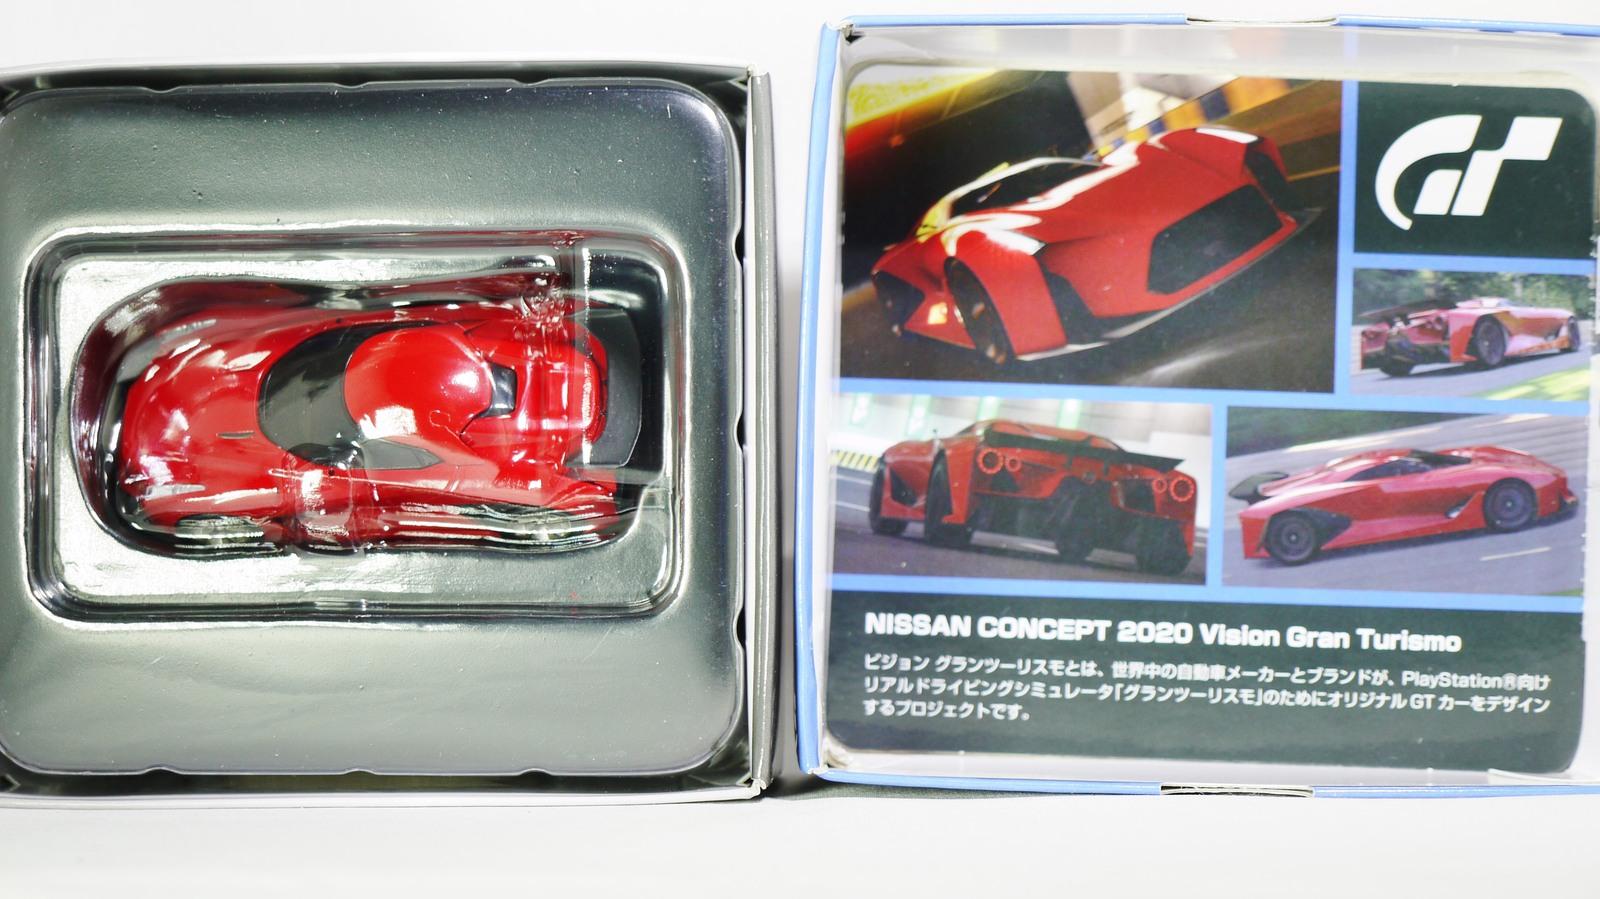 TOMICA TOMYTEC VINTAGE NEO GT NISSAN CONCEPT 2020 Vision Gran Turismo Red